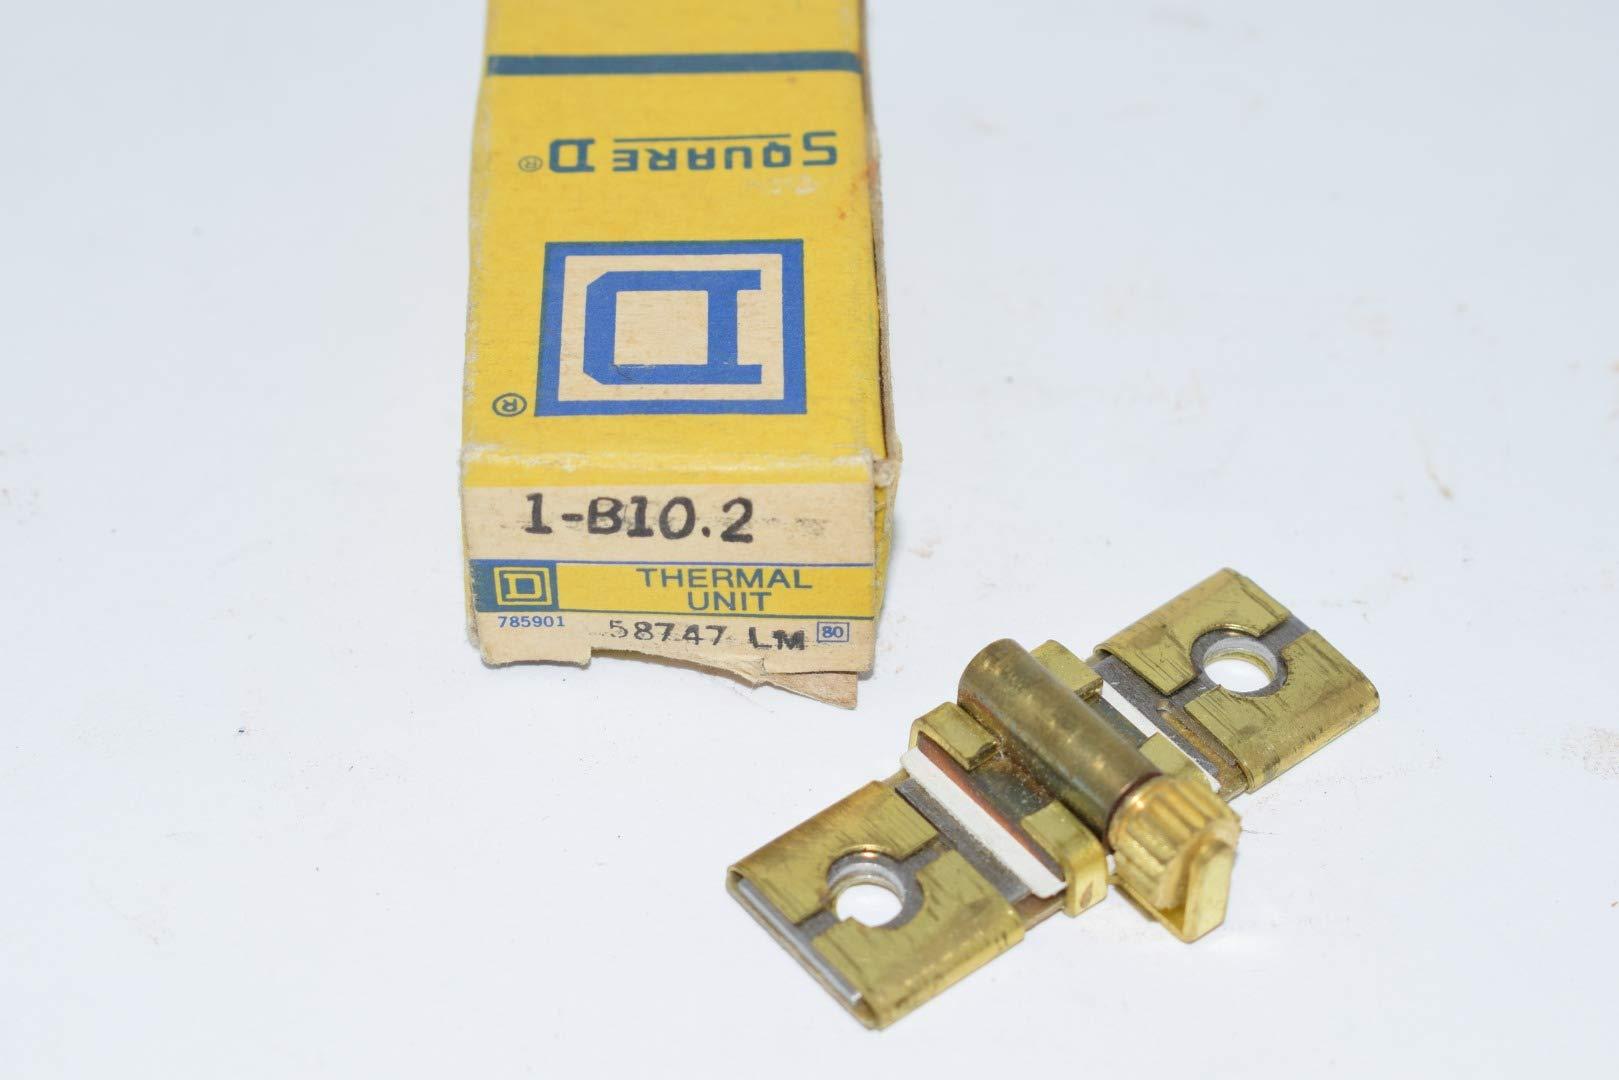 4 SQUARE D B2.10 OVERLOAD RELAY THERMAL UNIT B 2.10 NIB